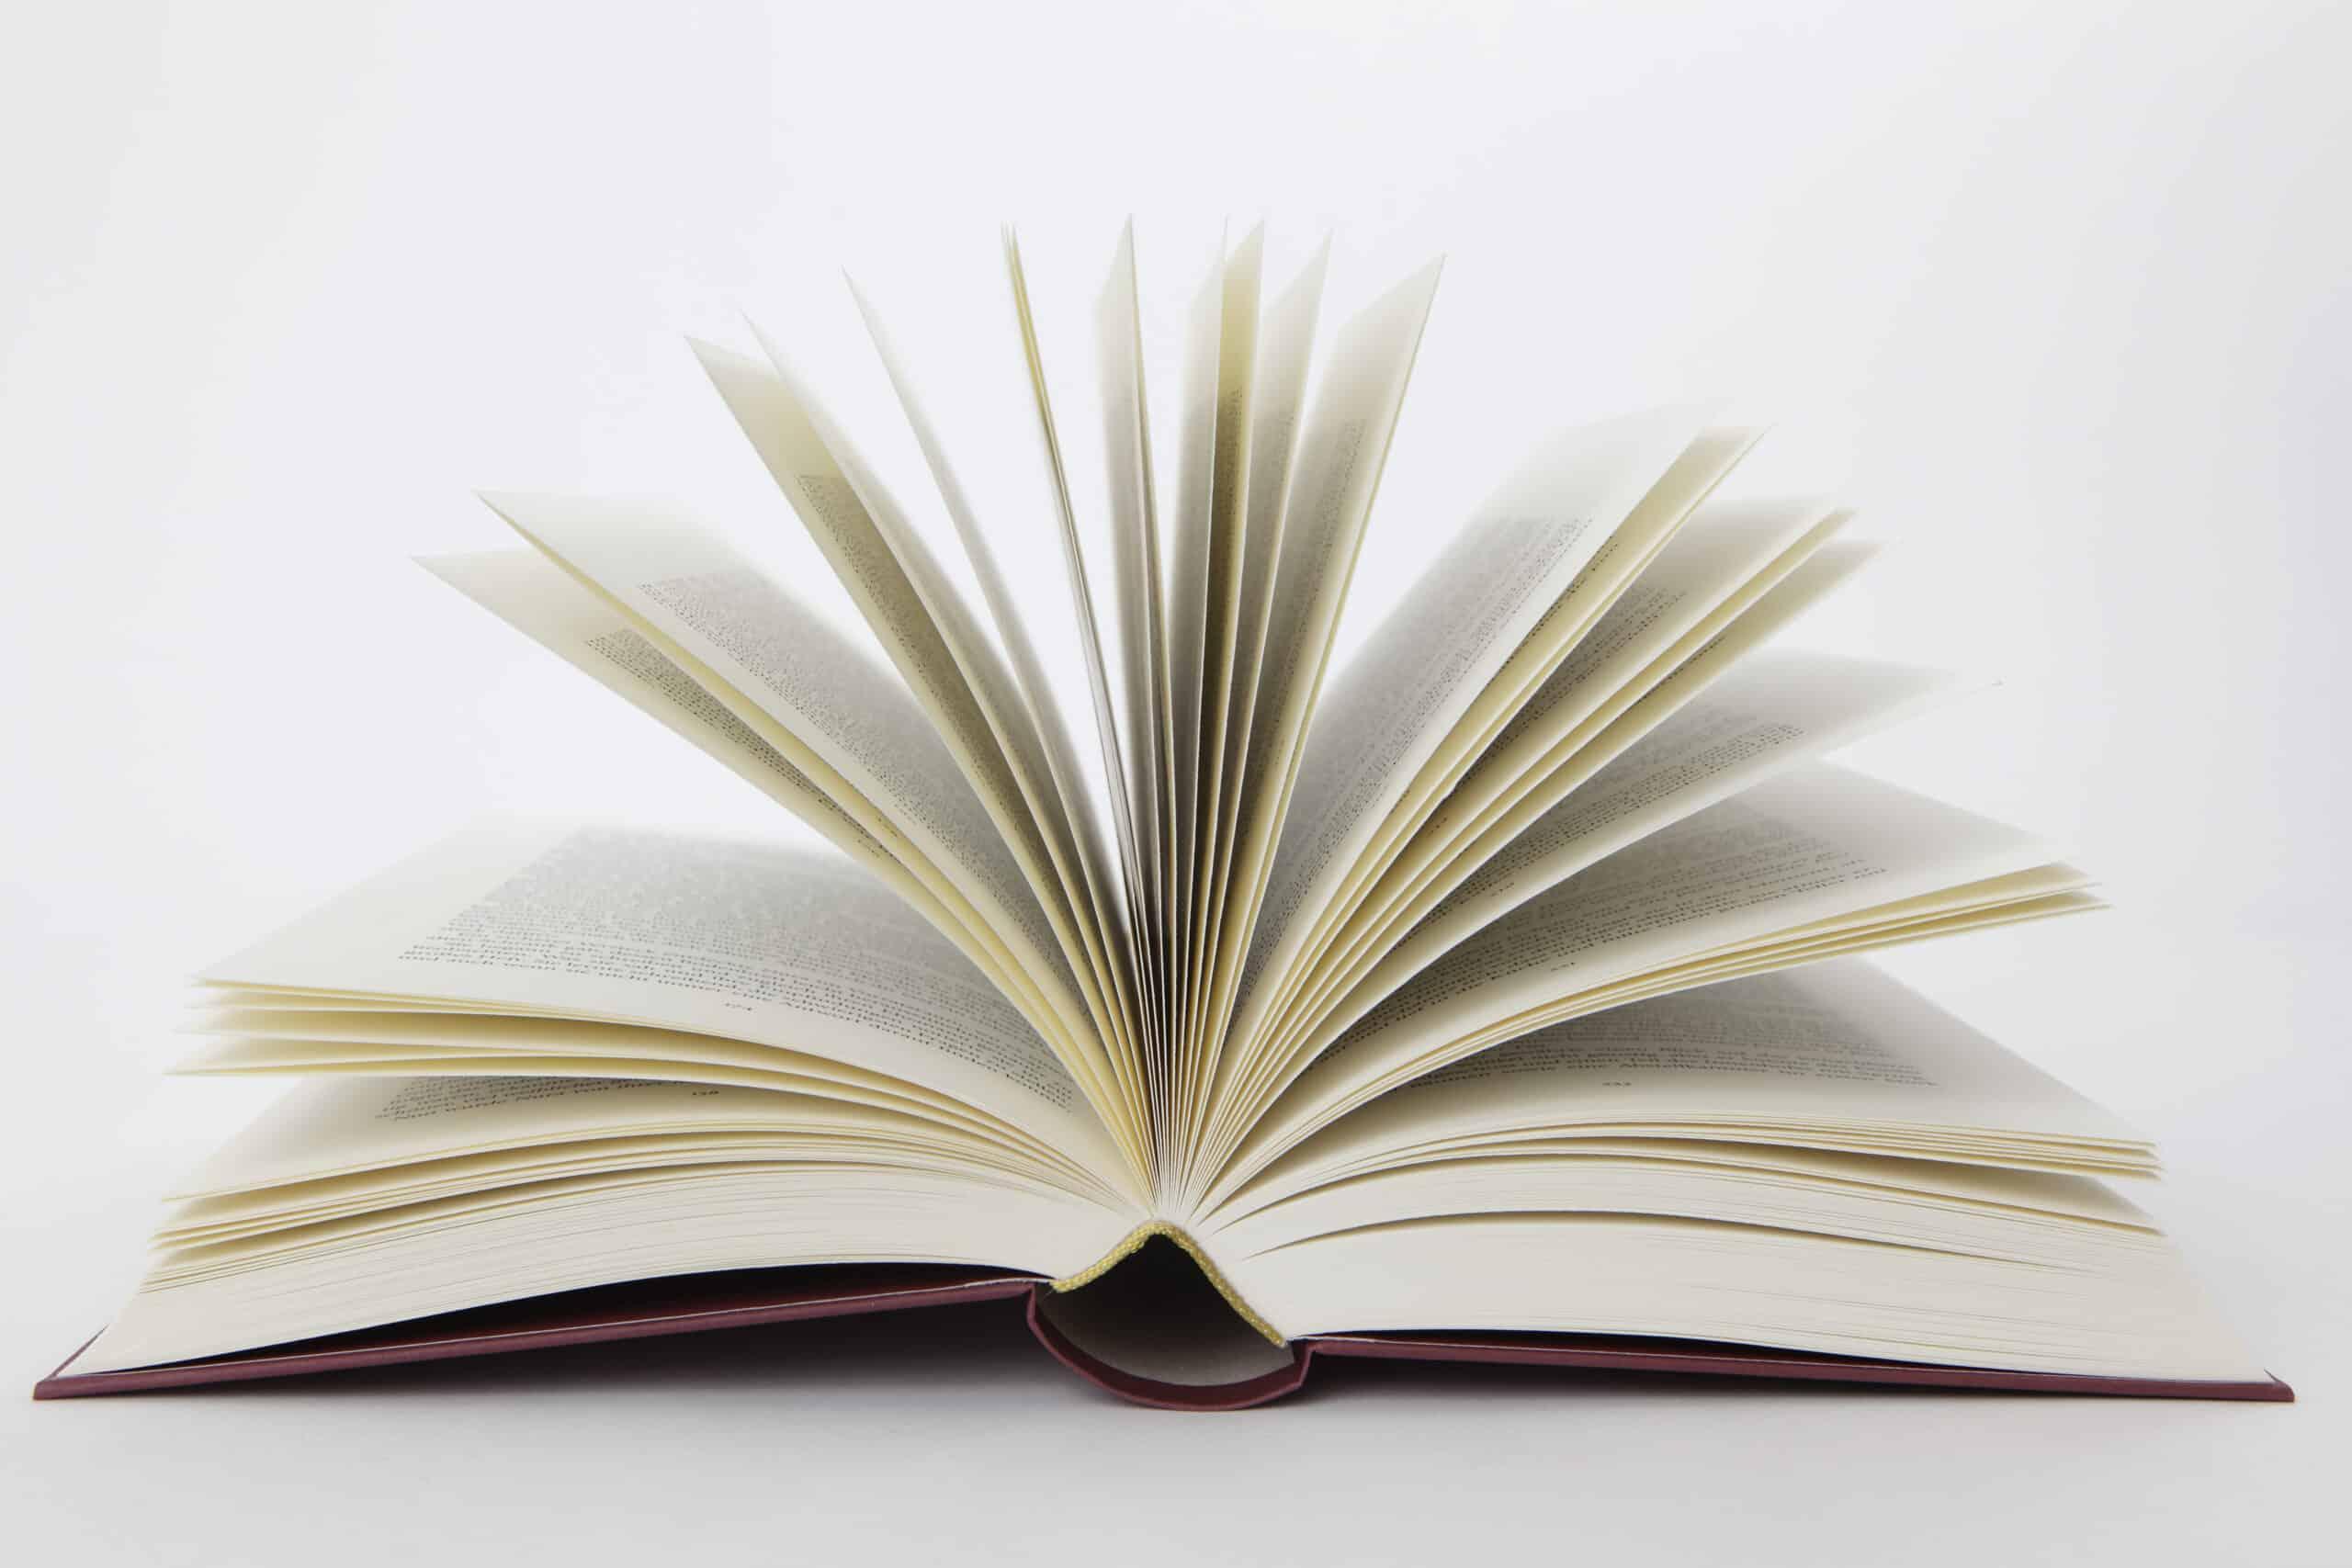 VALUE OF GOOD BOOKS